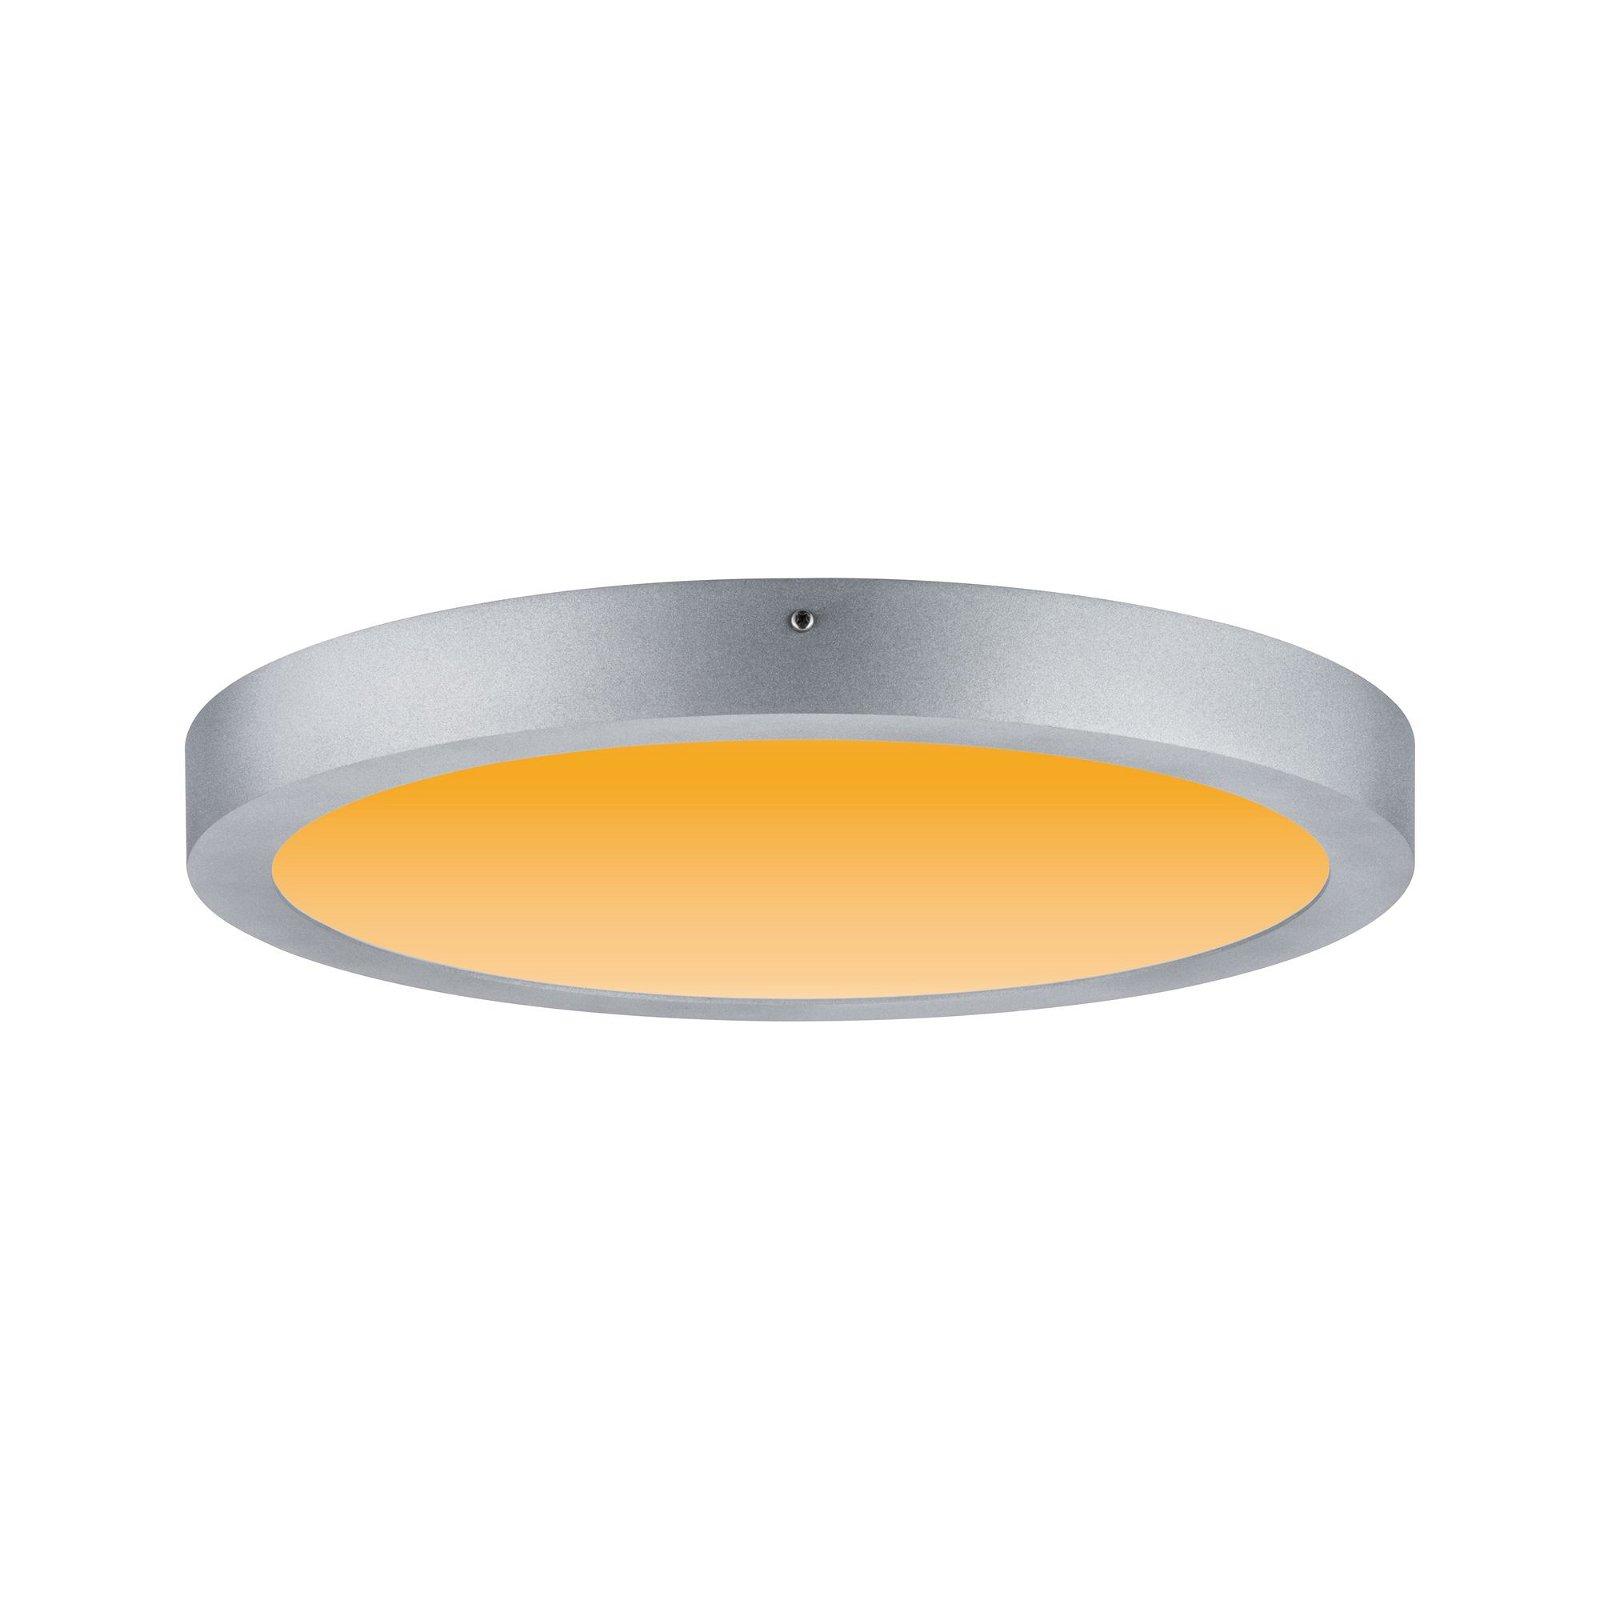 LED Panel Carpo round 400mm 2300 - 3000K Chrome matt